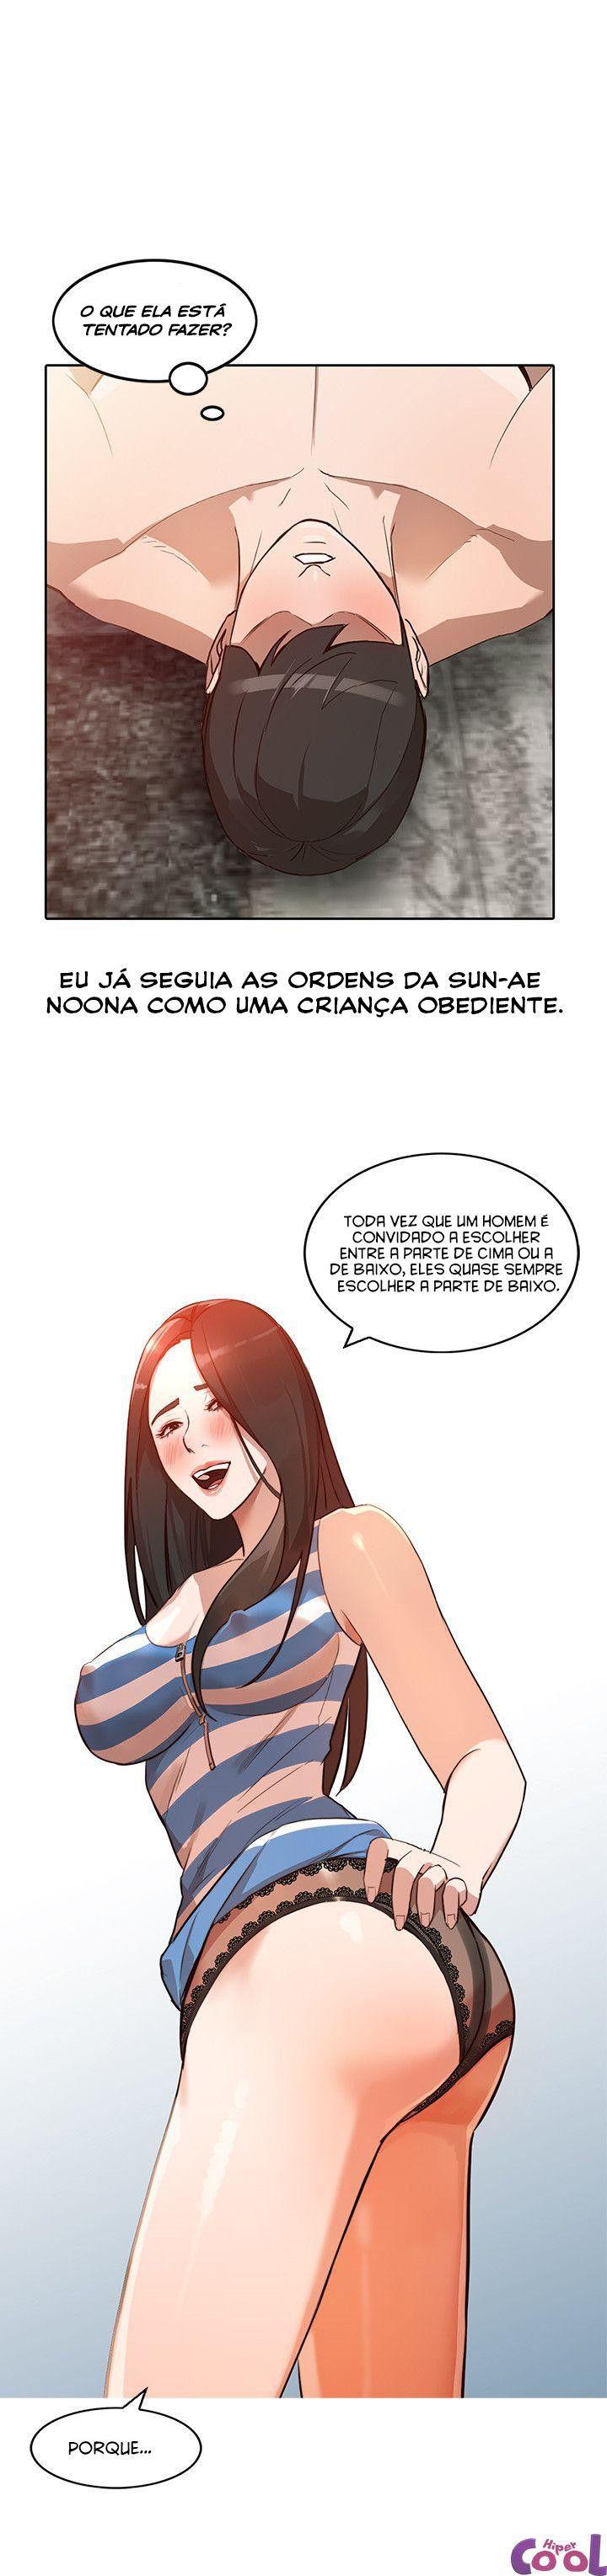 Mulher Casada 02 - Foto 20